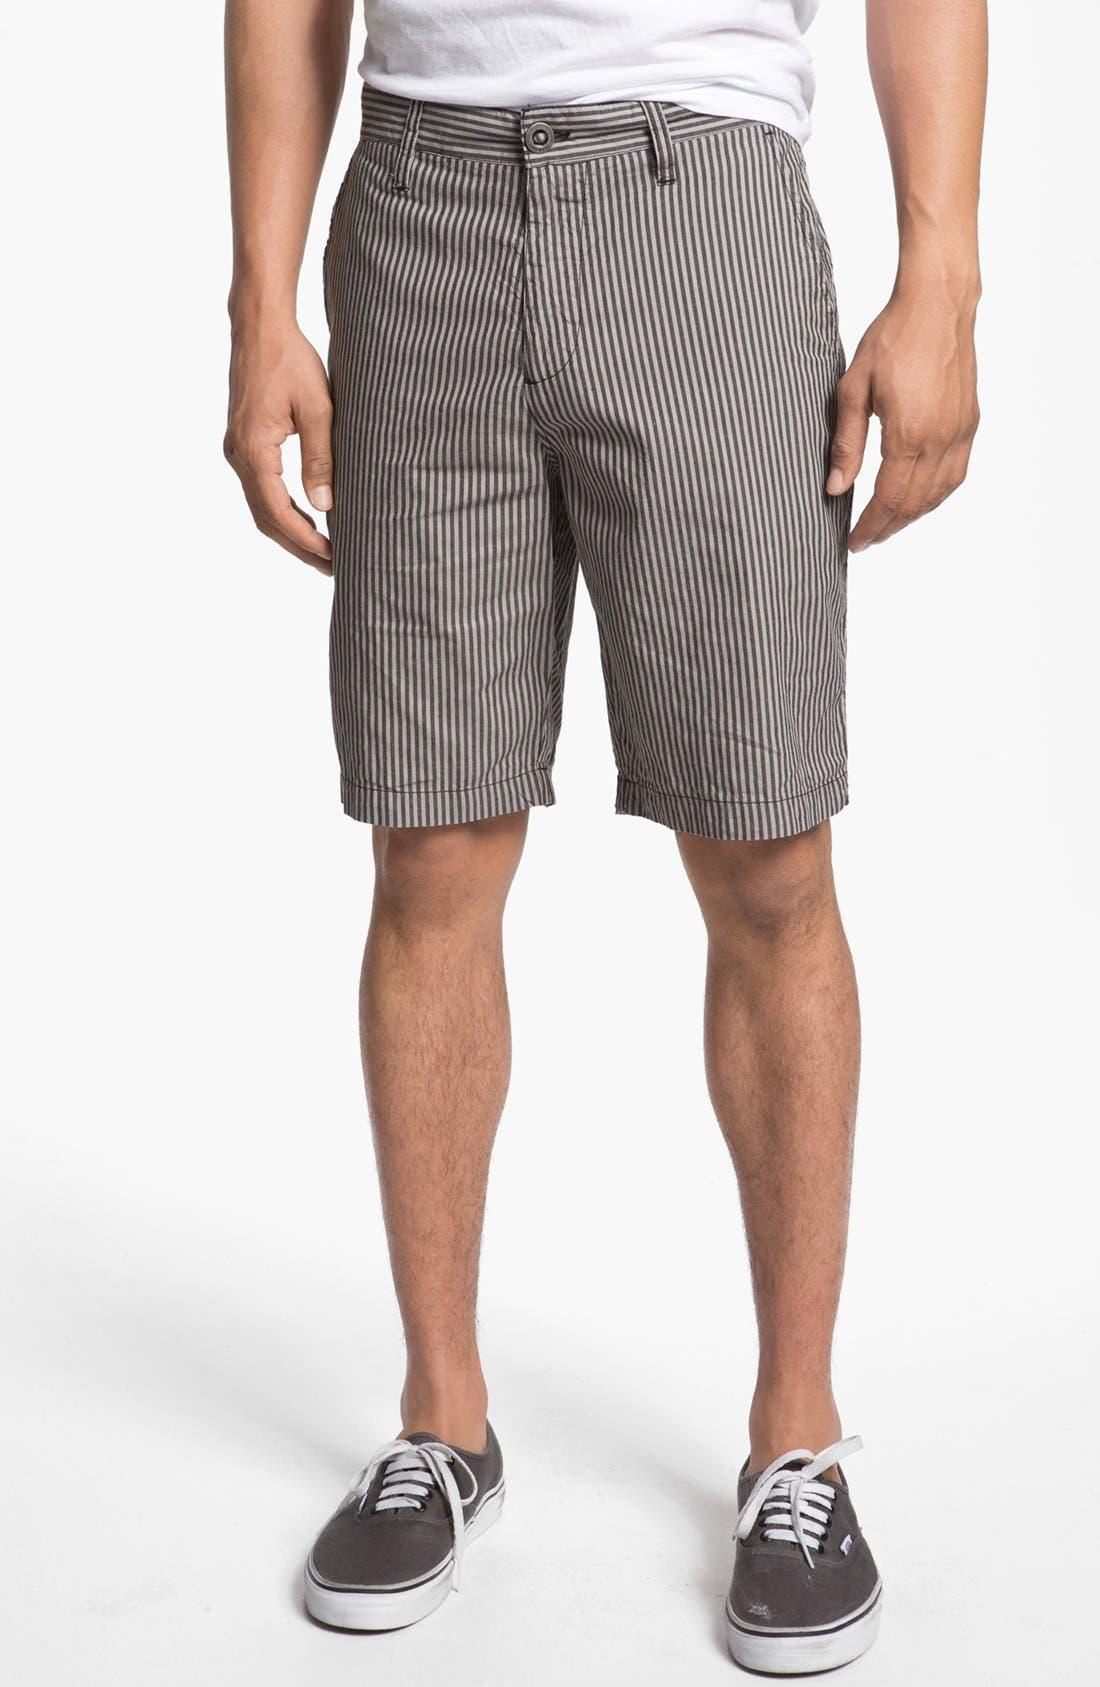 Alternate Image 1 Selected - Volcom 'Loco' Chino Shorts